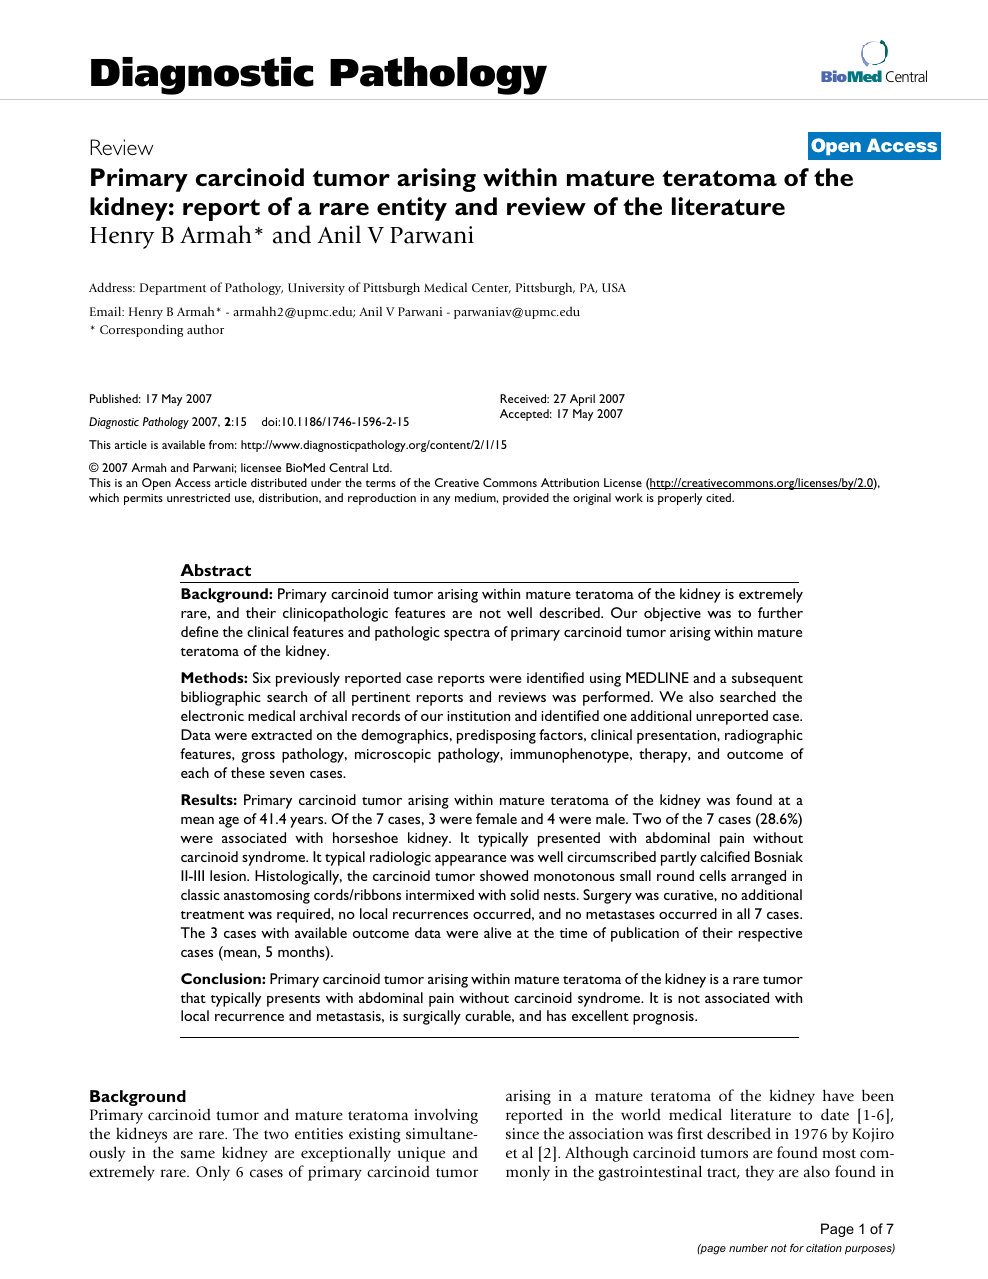 Primary carcinoid tumor arising within mature teratoma of